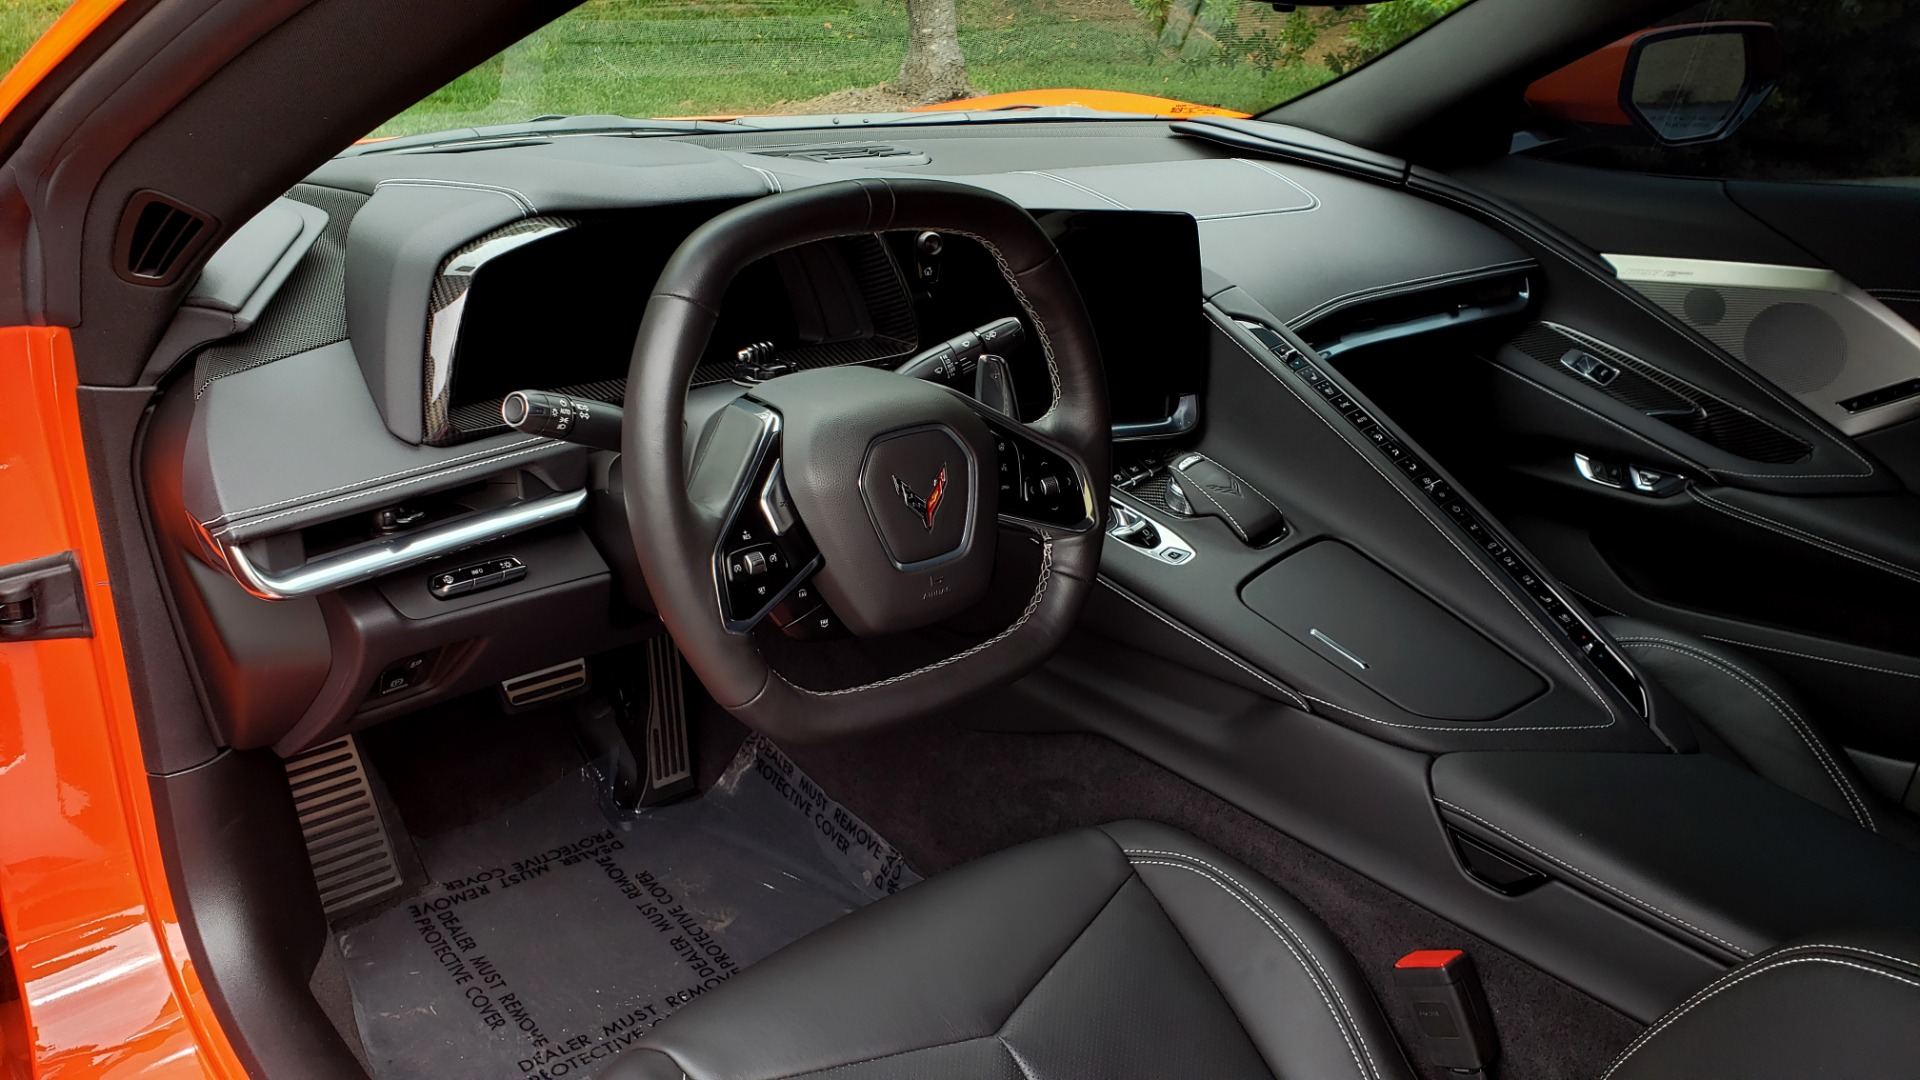 Used 2020 Chevrolet CORVETTE C8 STINGRAY 2LT / 6.2L V8 / 8-SPD AUTO / NAV / BOSE / REARVIEW / DATA RECOR for sale Sold at Formula Imports in Charlotte NC 28227 42